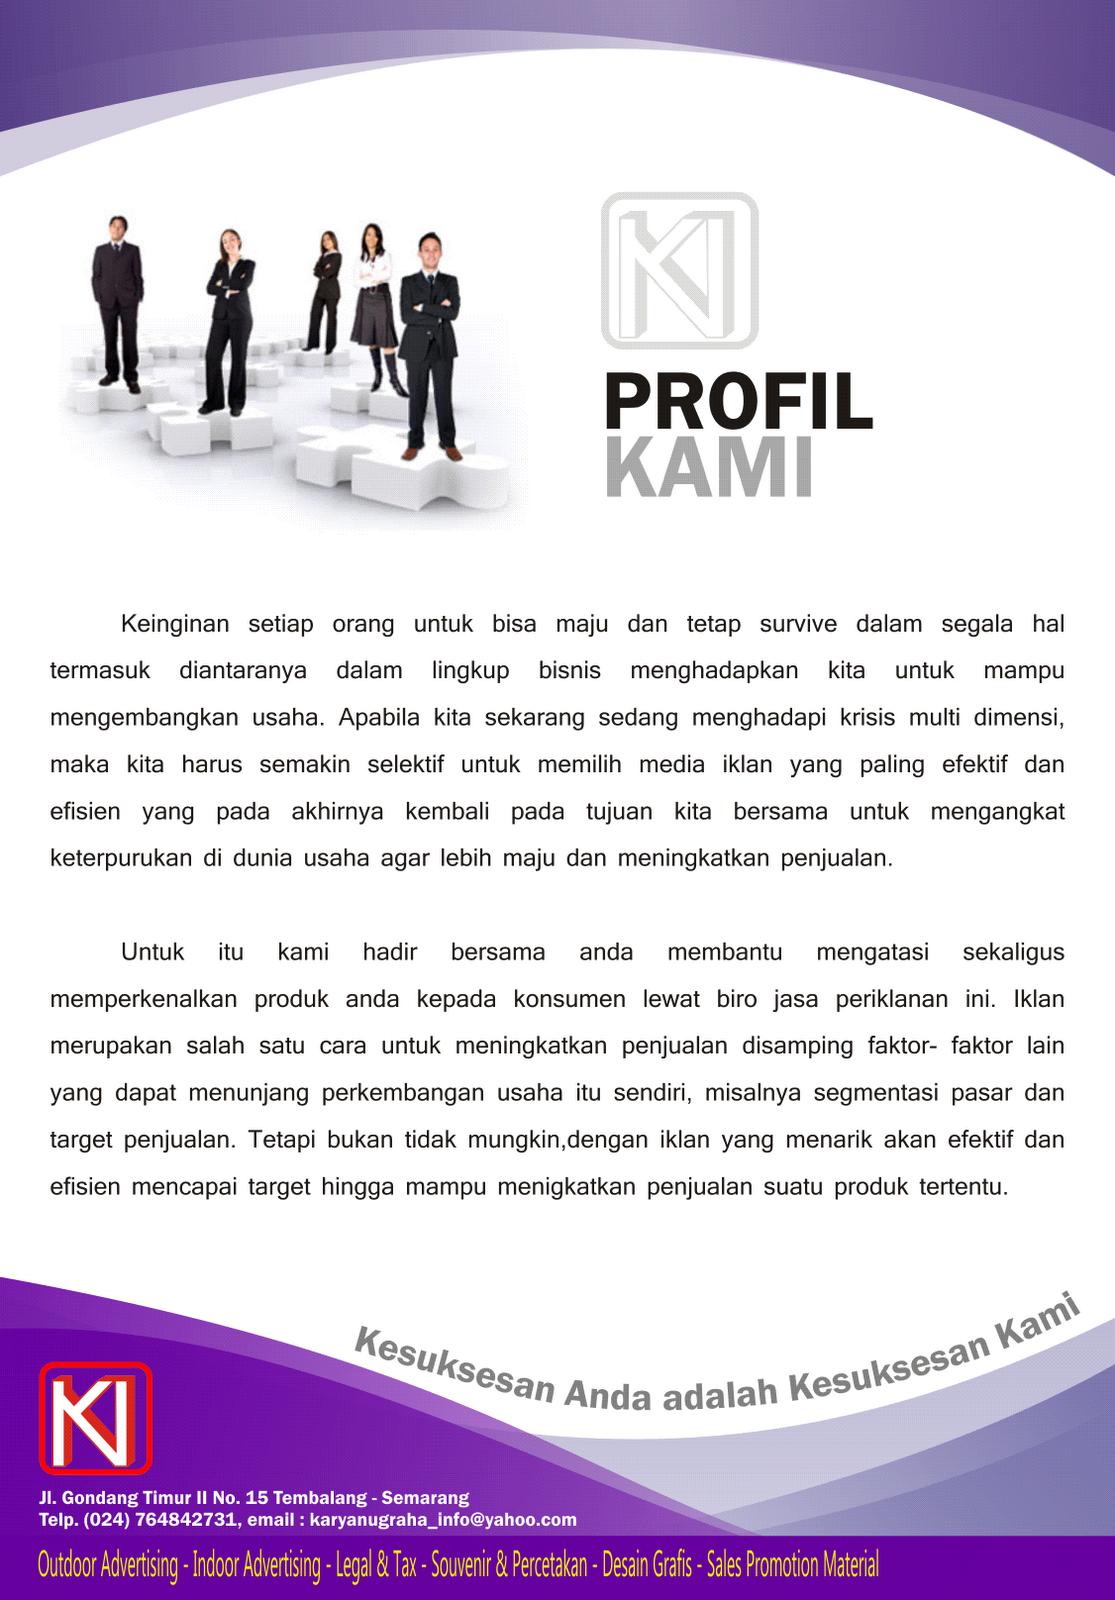 Contoh Company Profile Brajamusti Sangkala